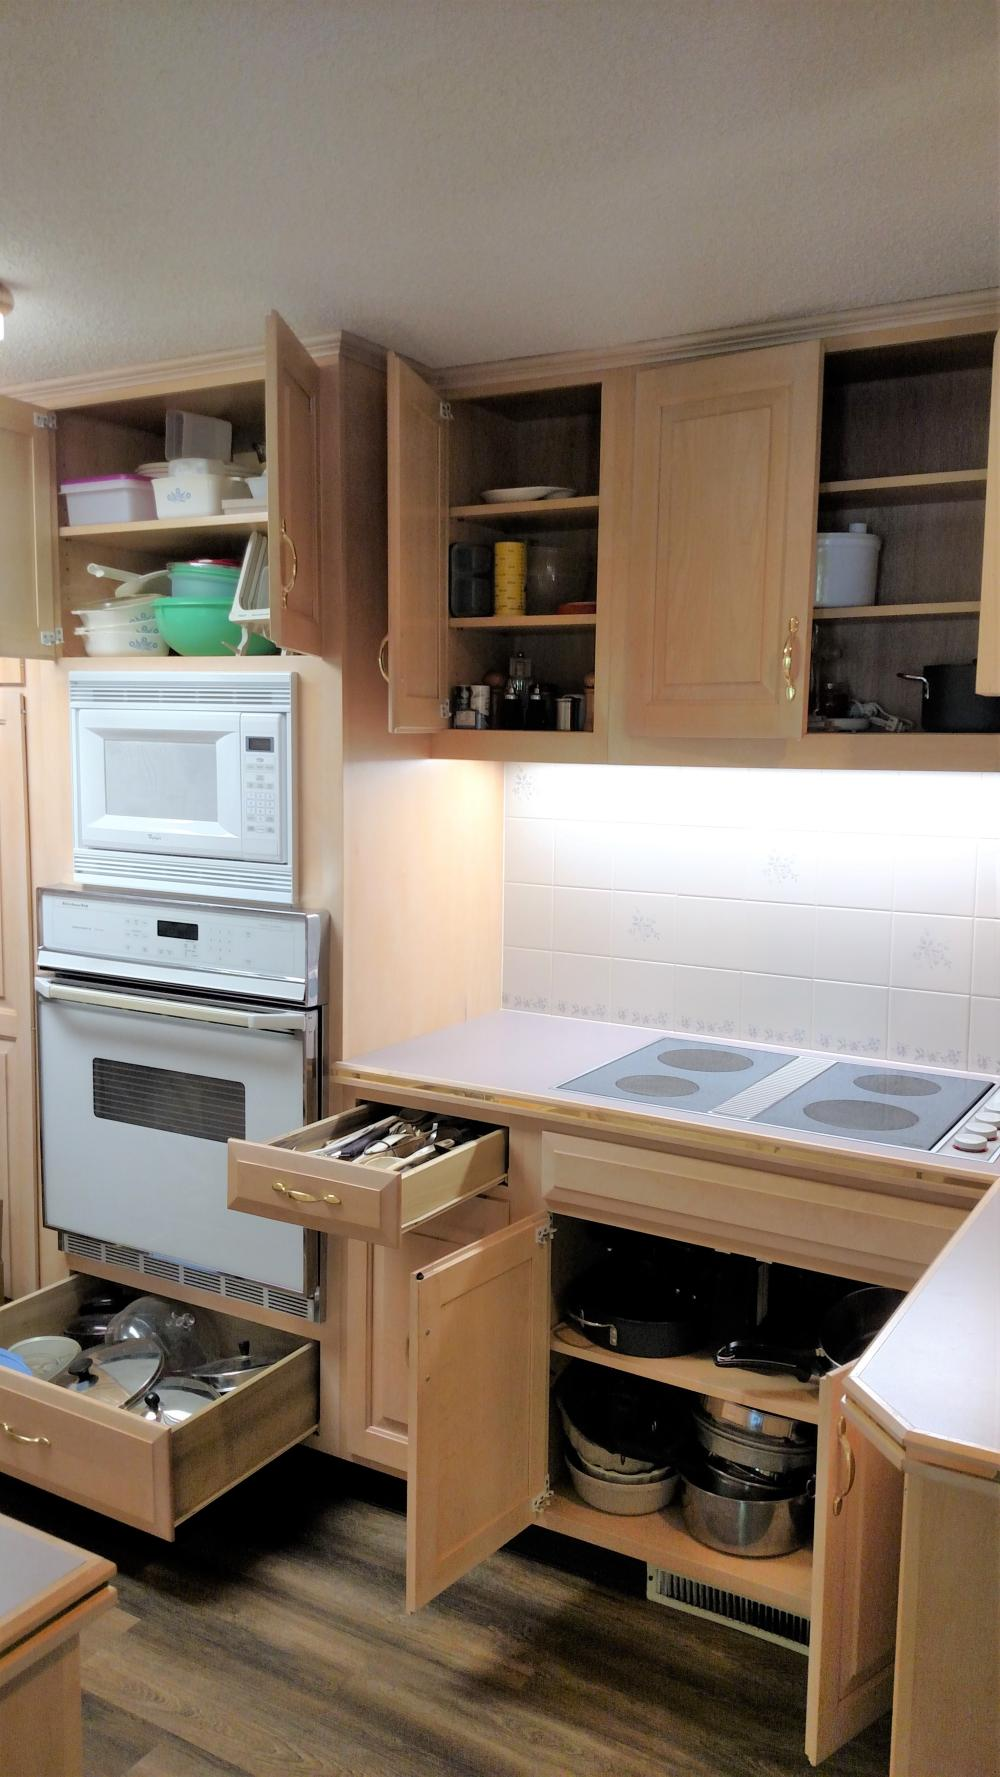 kitchen ware package - Corning ware, pots and pans, lids, kitchen utensils, Farberware